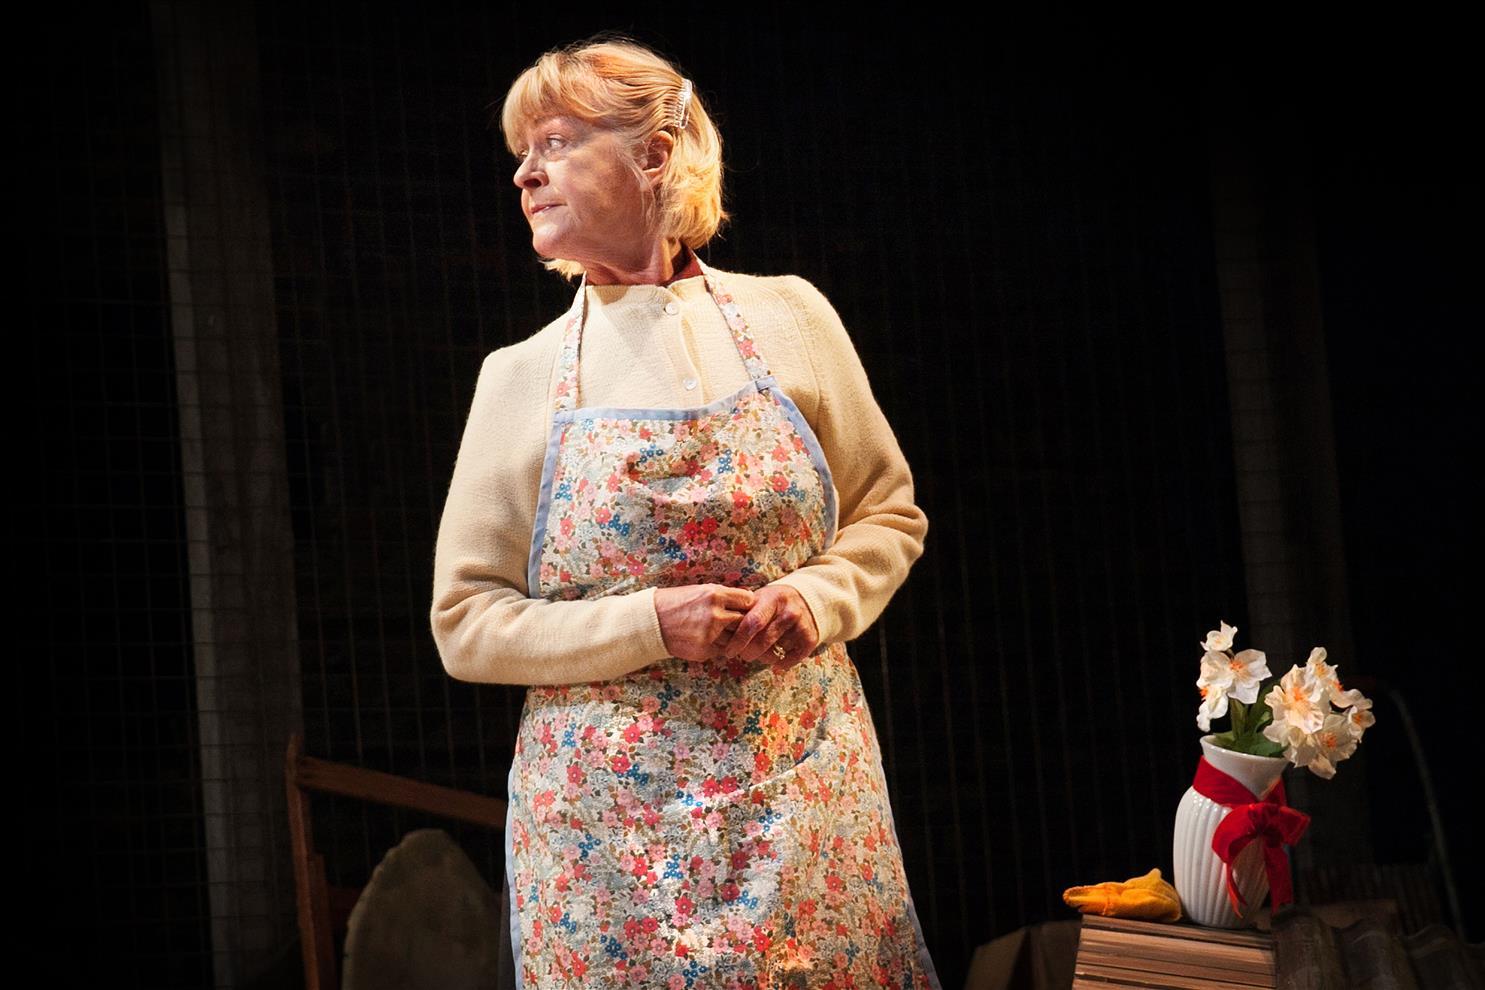 Carole Dance as Doris - My Mother Said - London Classic Theatre